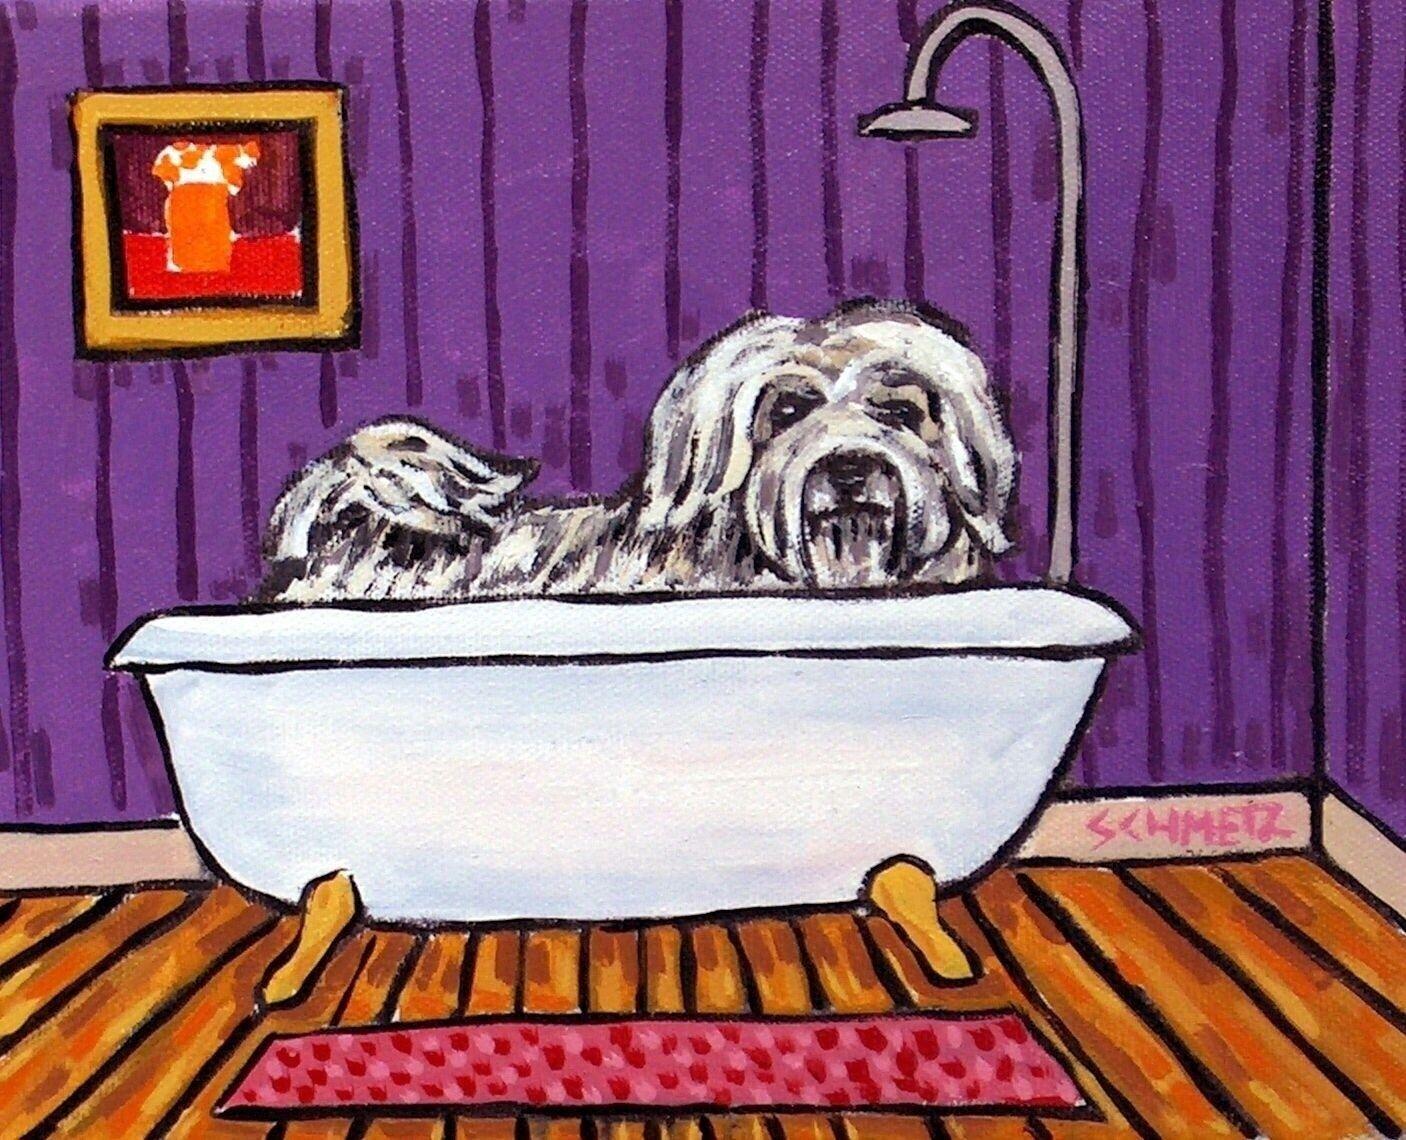 Havanese dog bathrom pet salon 8.5x11  artist prints artwork gift